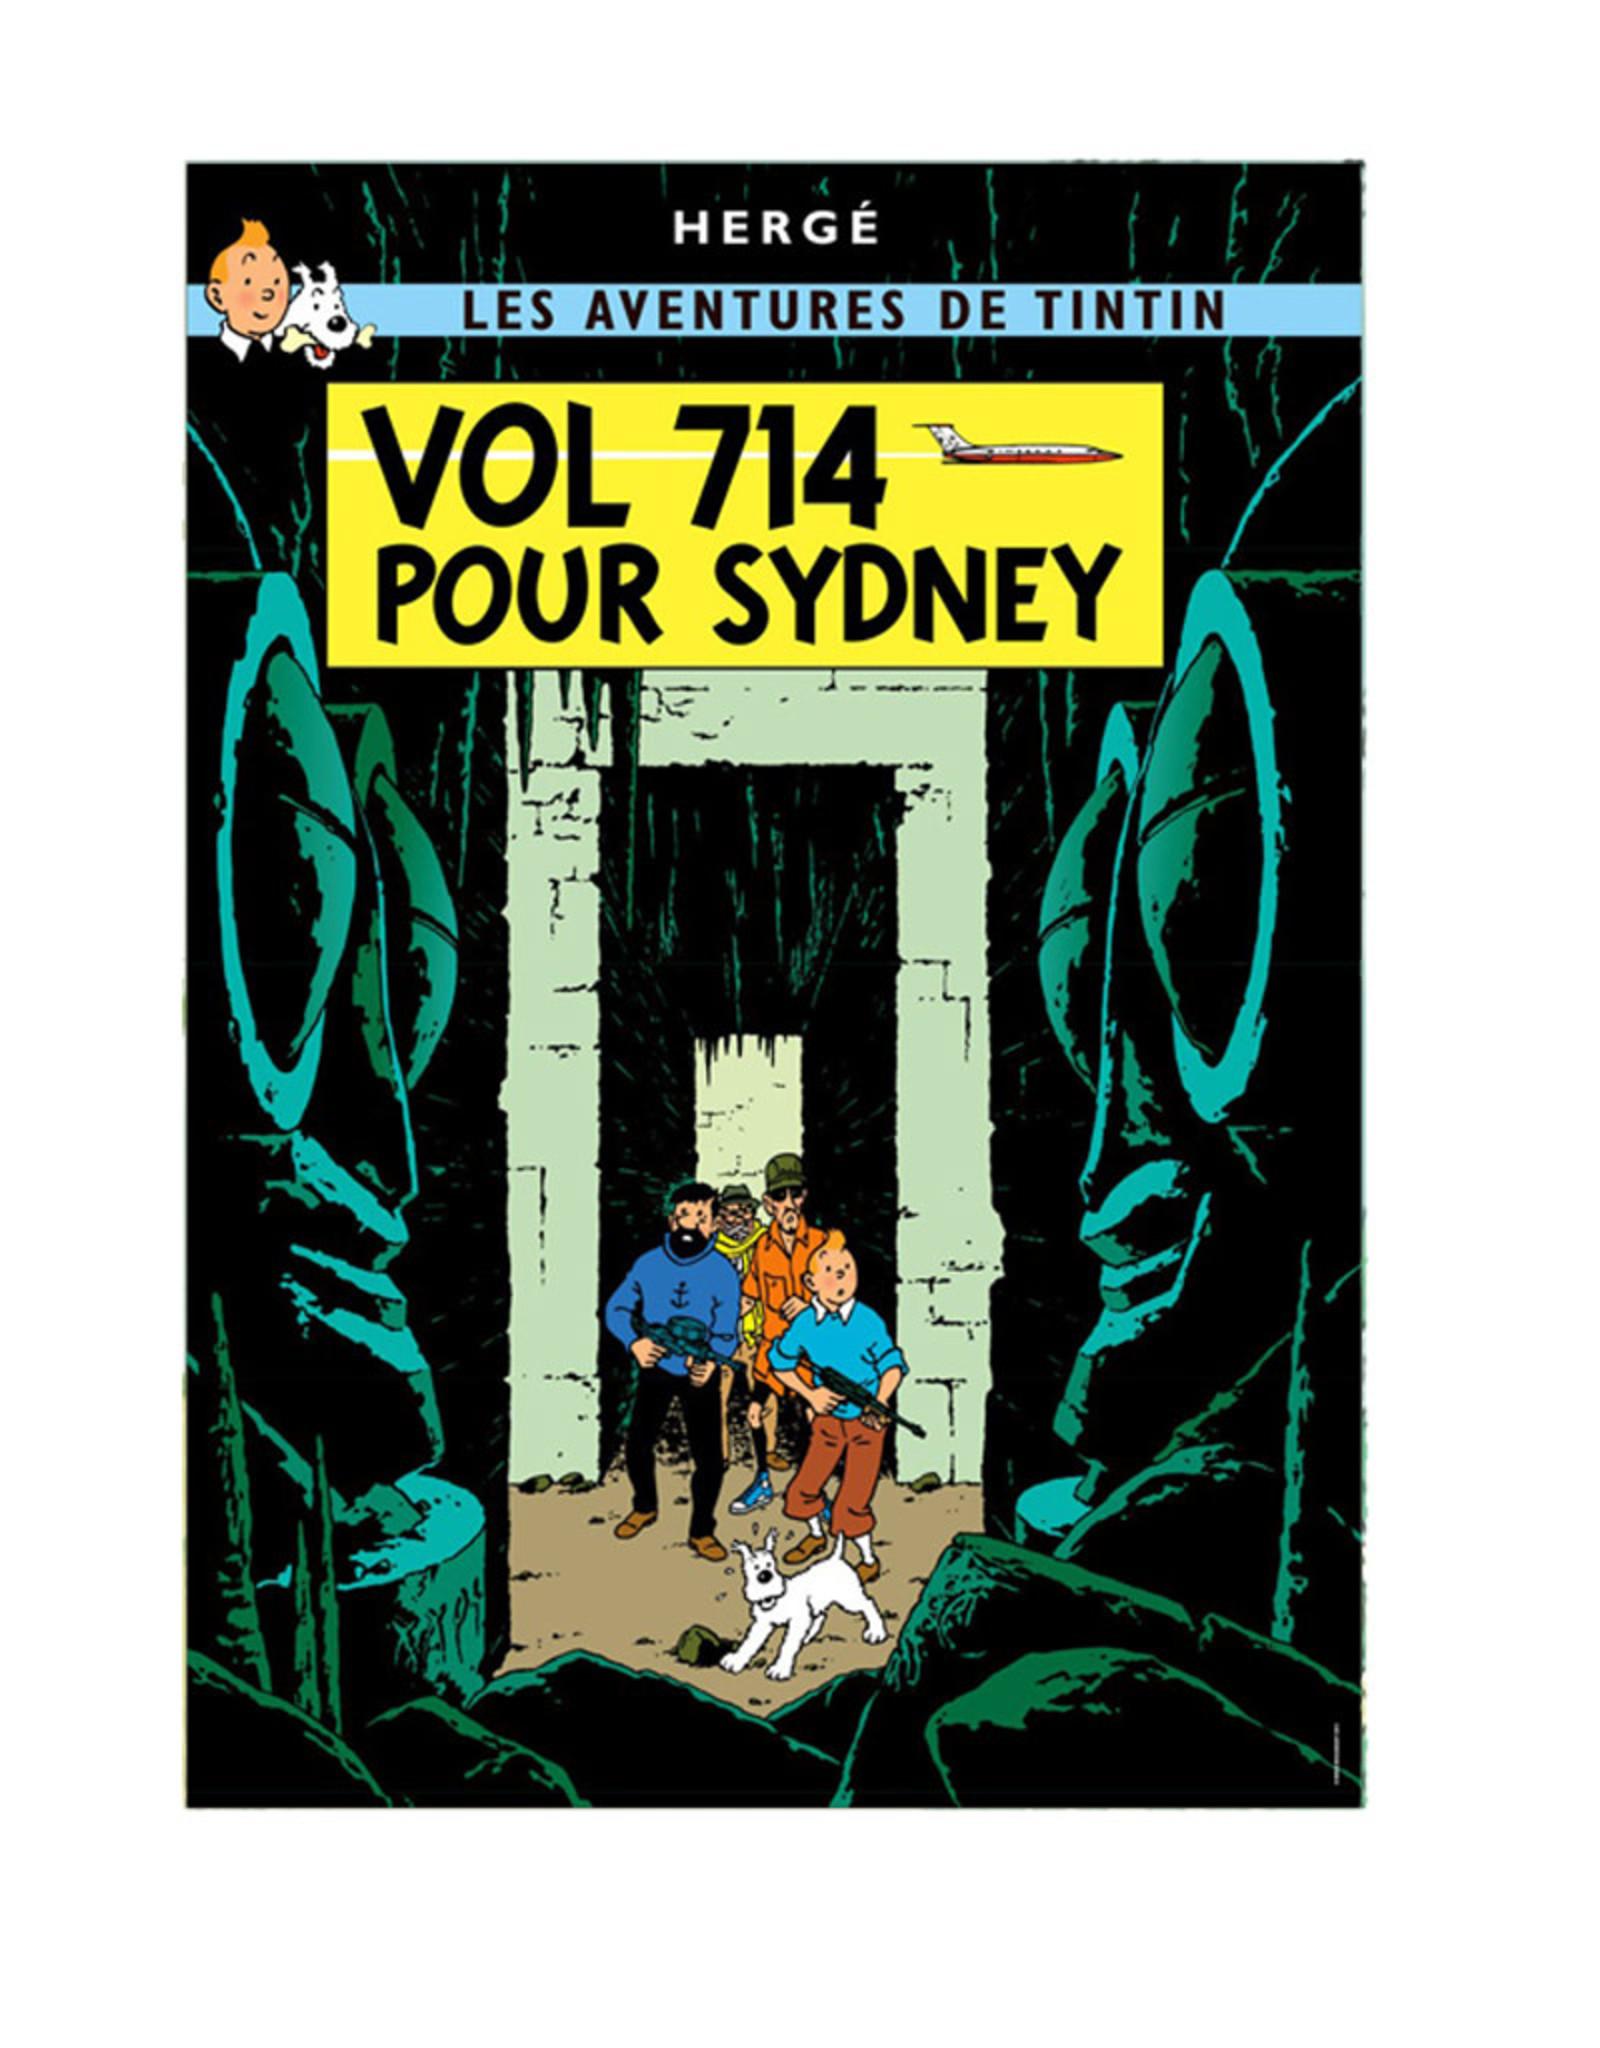 Tintin Tintin ( BD #22 ) Vol 714 pour Sydney